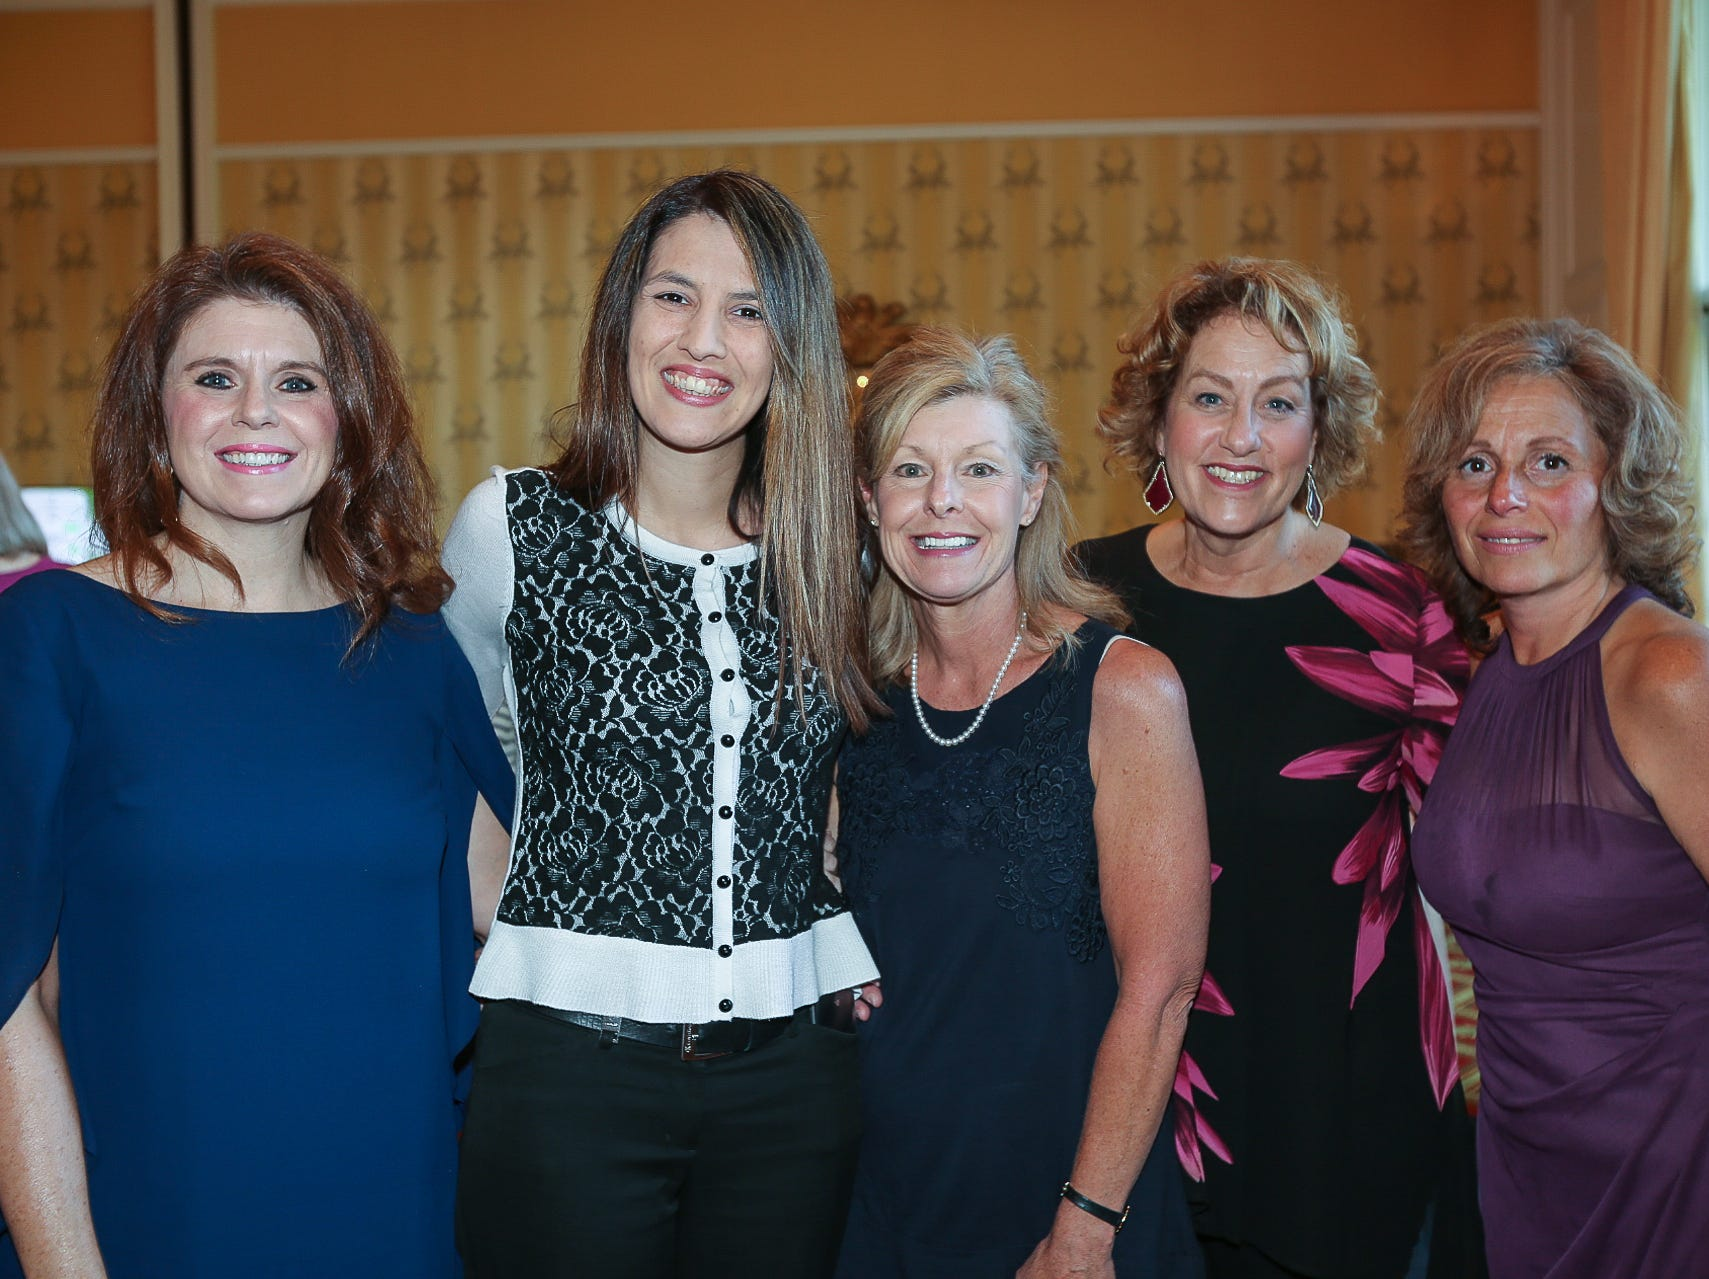 Jill Bright, Carrie Askins, Kim Farris, Terri Blackmon, and Cheryl Barrett